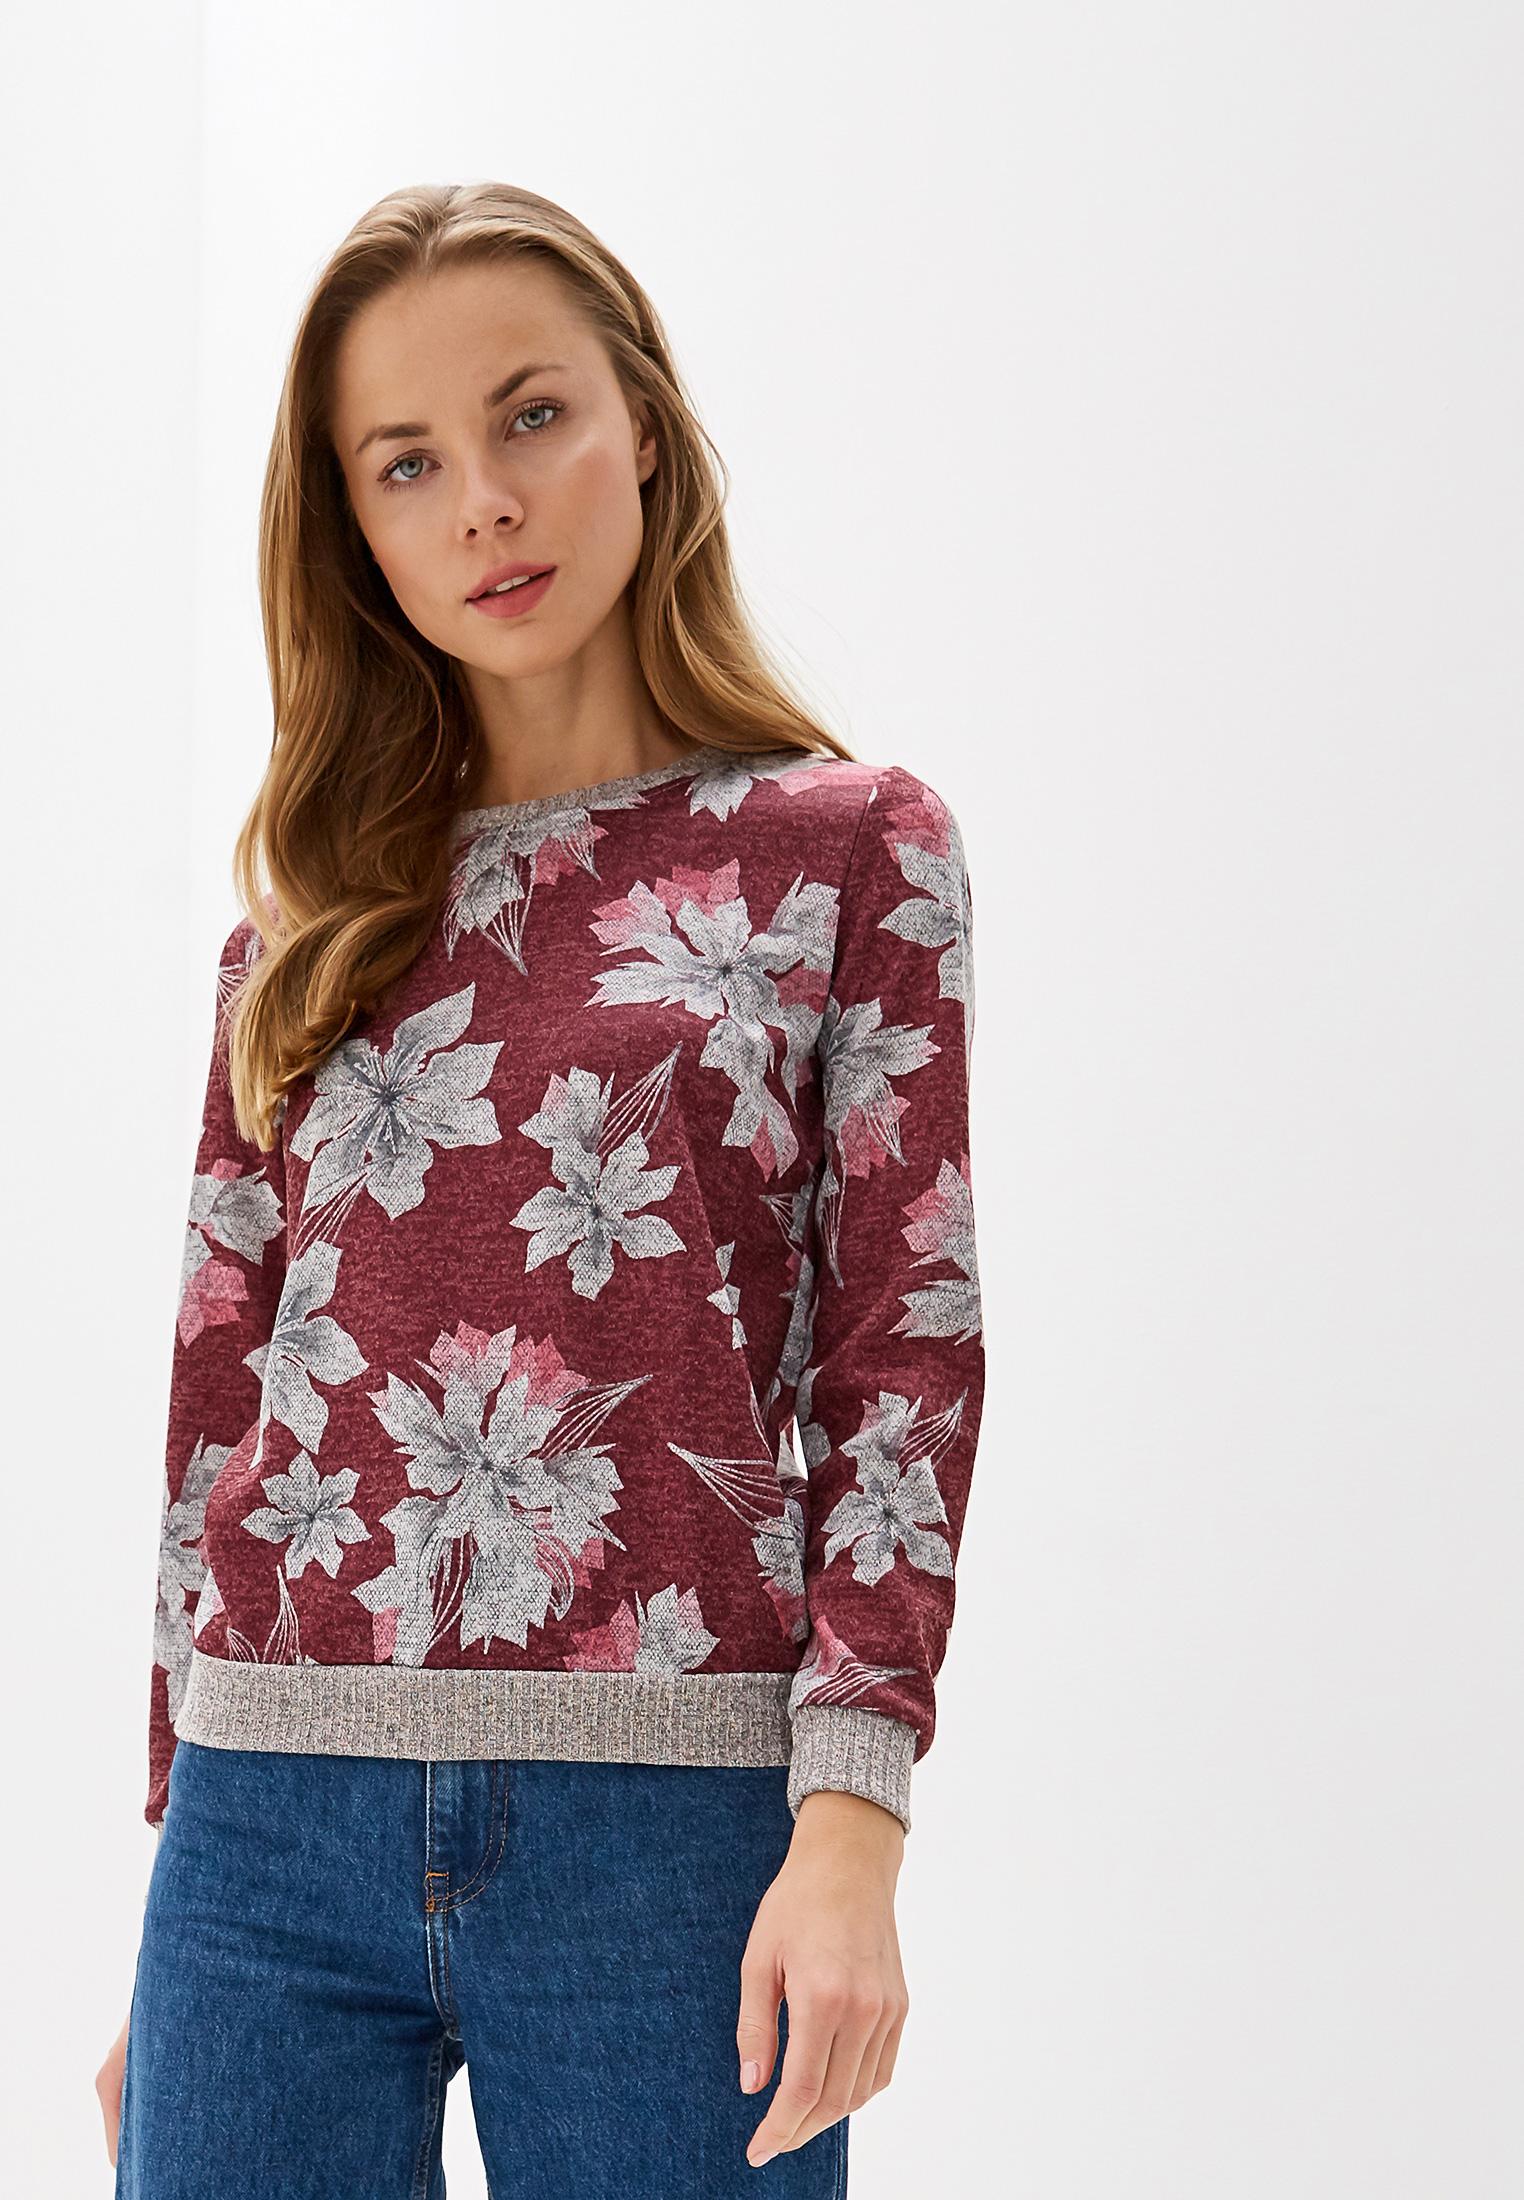 Джемпер, Kontaly, цвет: бордовый. Артикул: MP002XW0QDAV. Одежда / Джемперы, свитеры и кардиганы